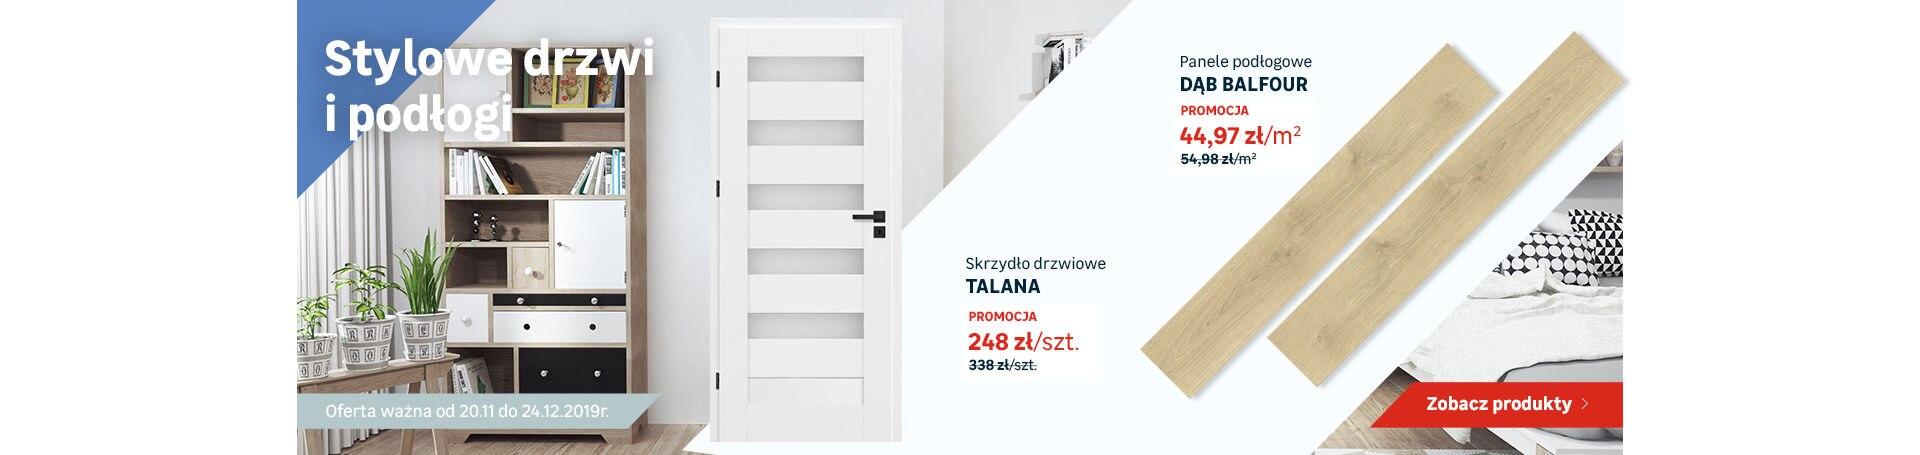 rr-drzwi-podlogi-9-24.12.2019-1323x455